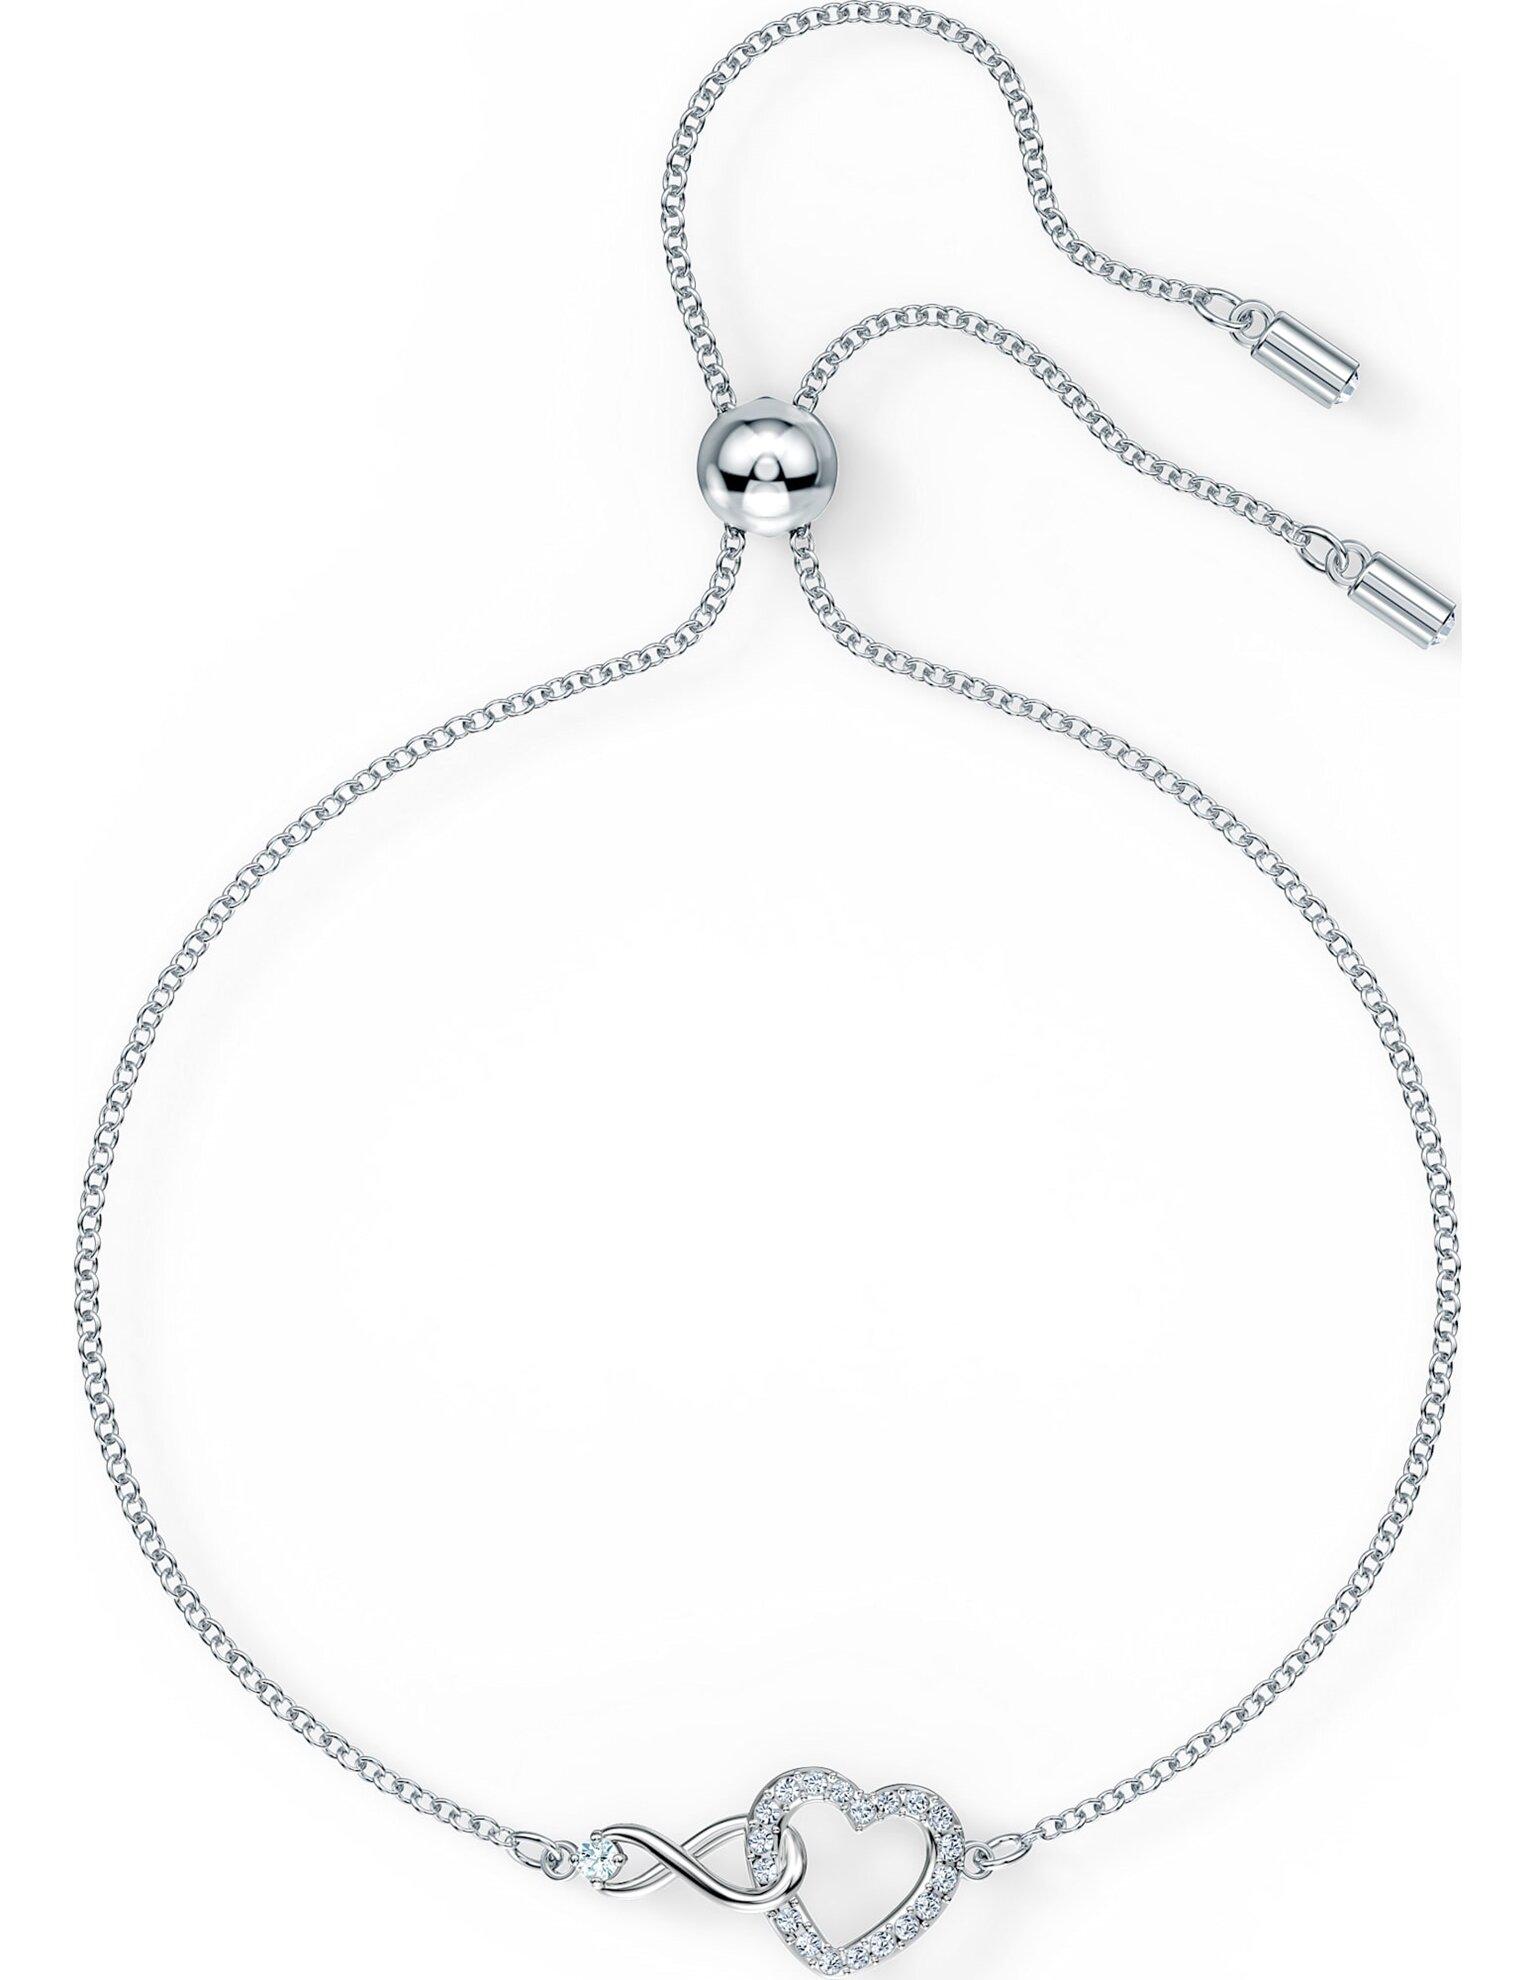 Picture of Swarovski Infinity Heart Bileklik, Beyaz, Rodyum kaplama